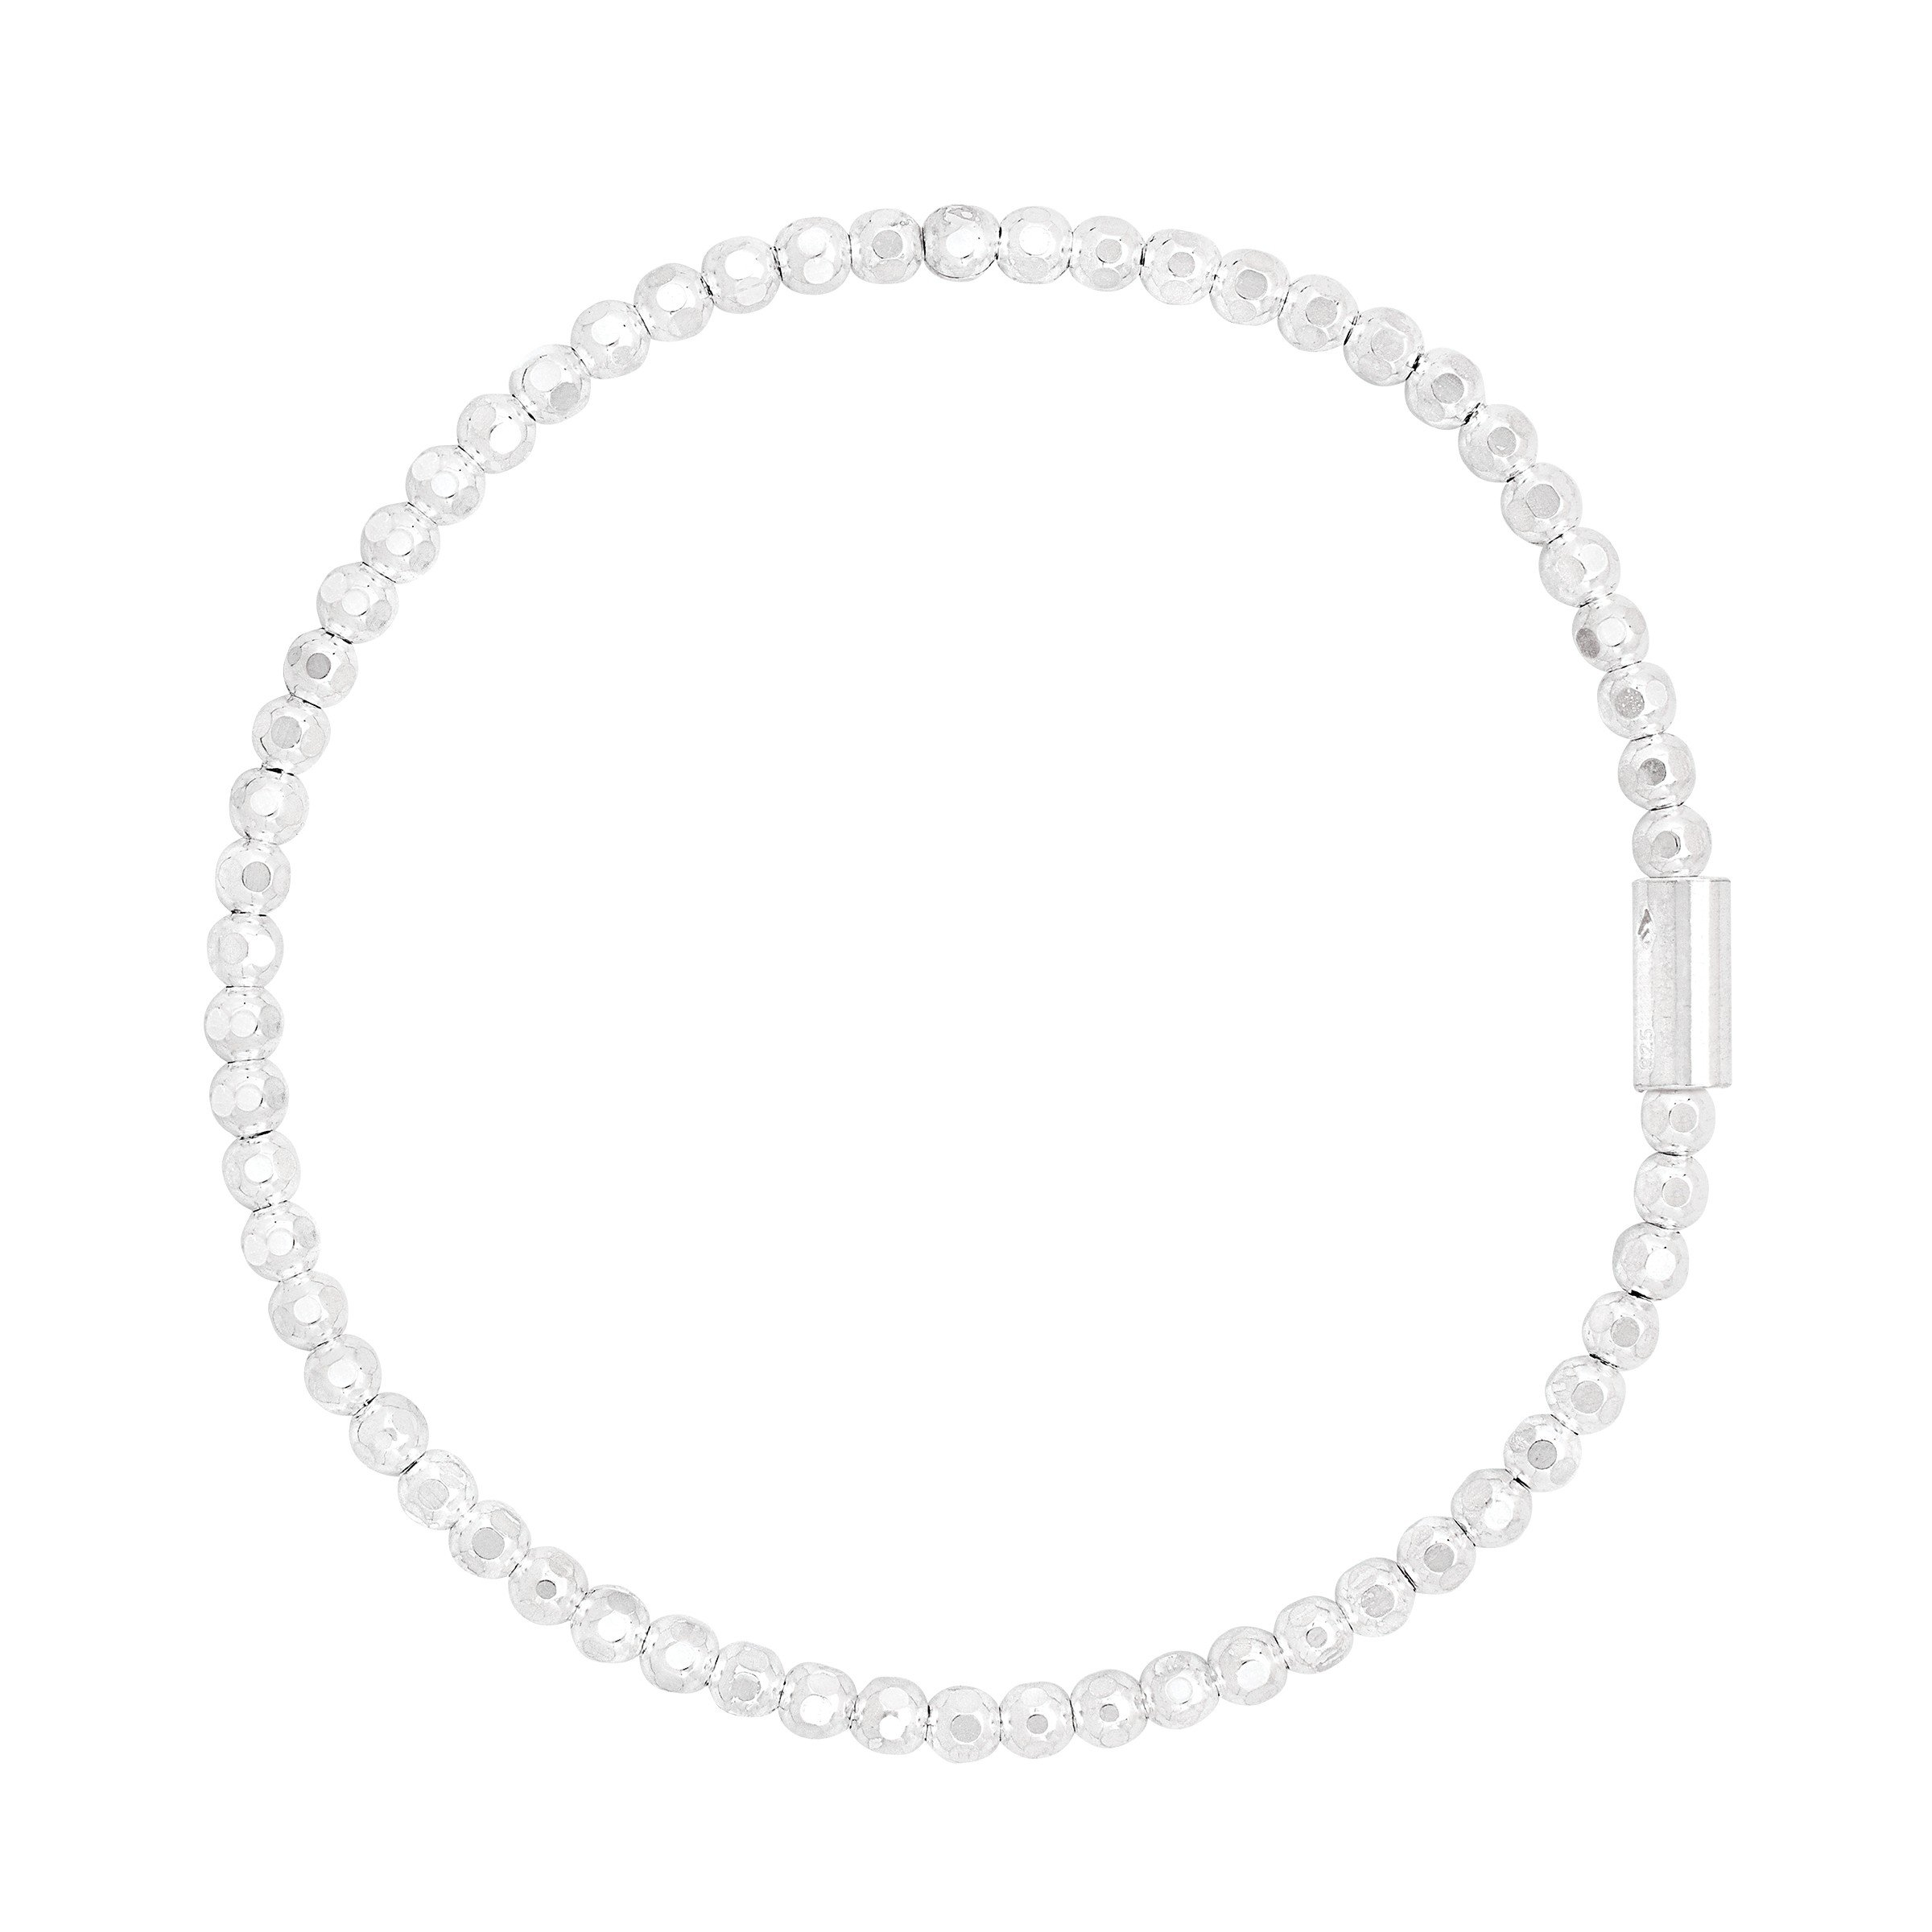 Silpada 'Charlotte' Sterling Silver Stretch Bracelet, 6.75''